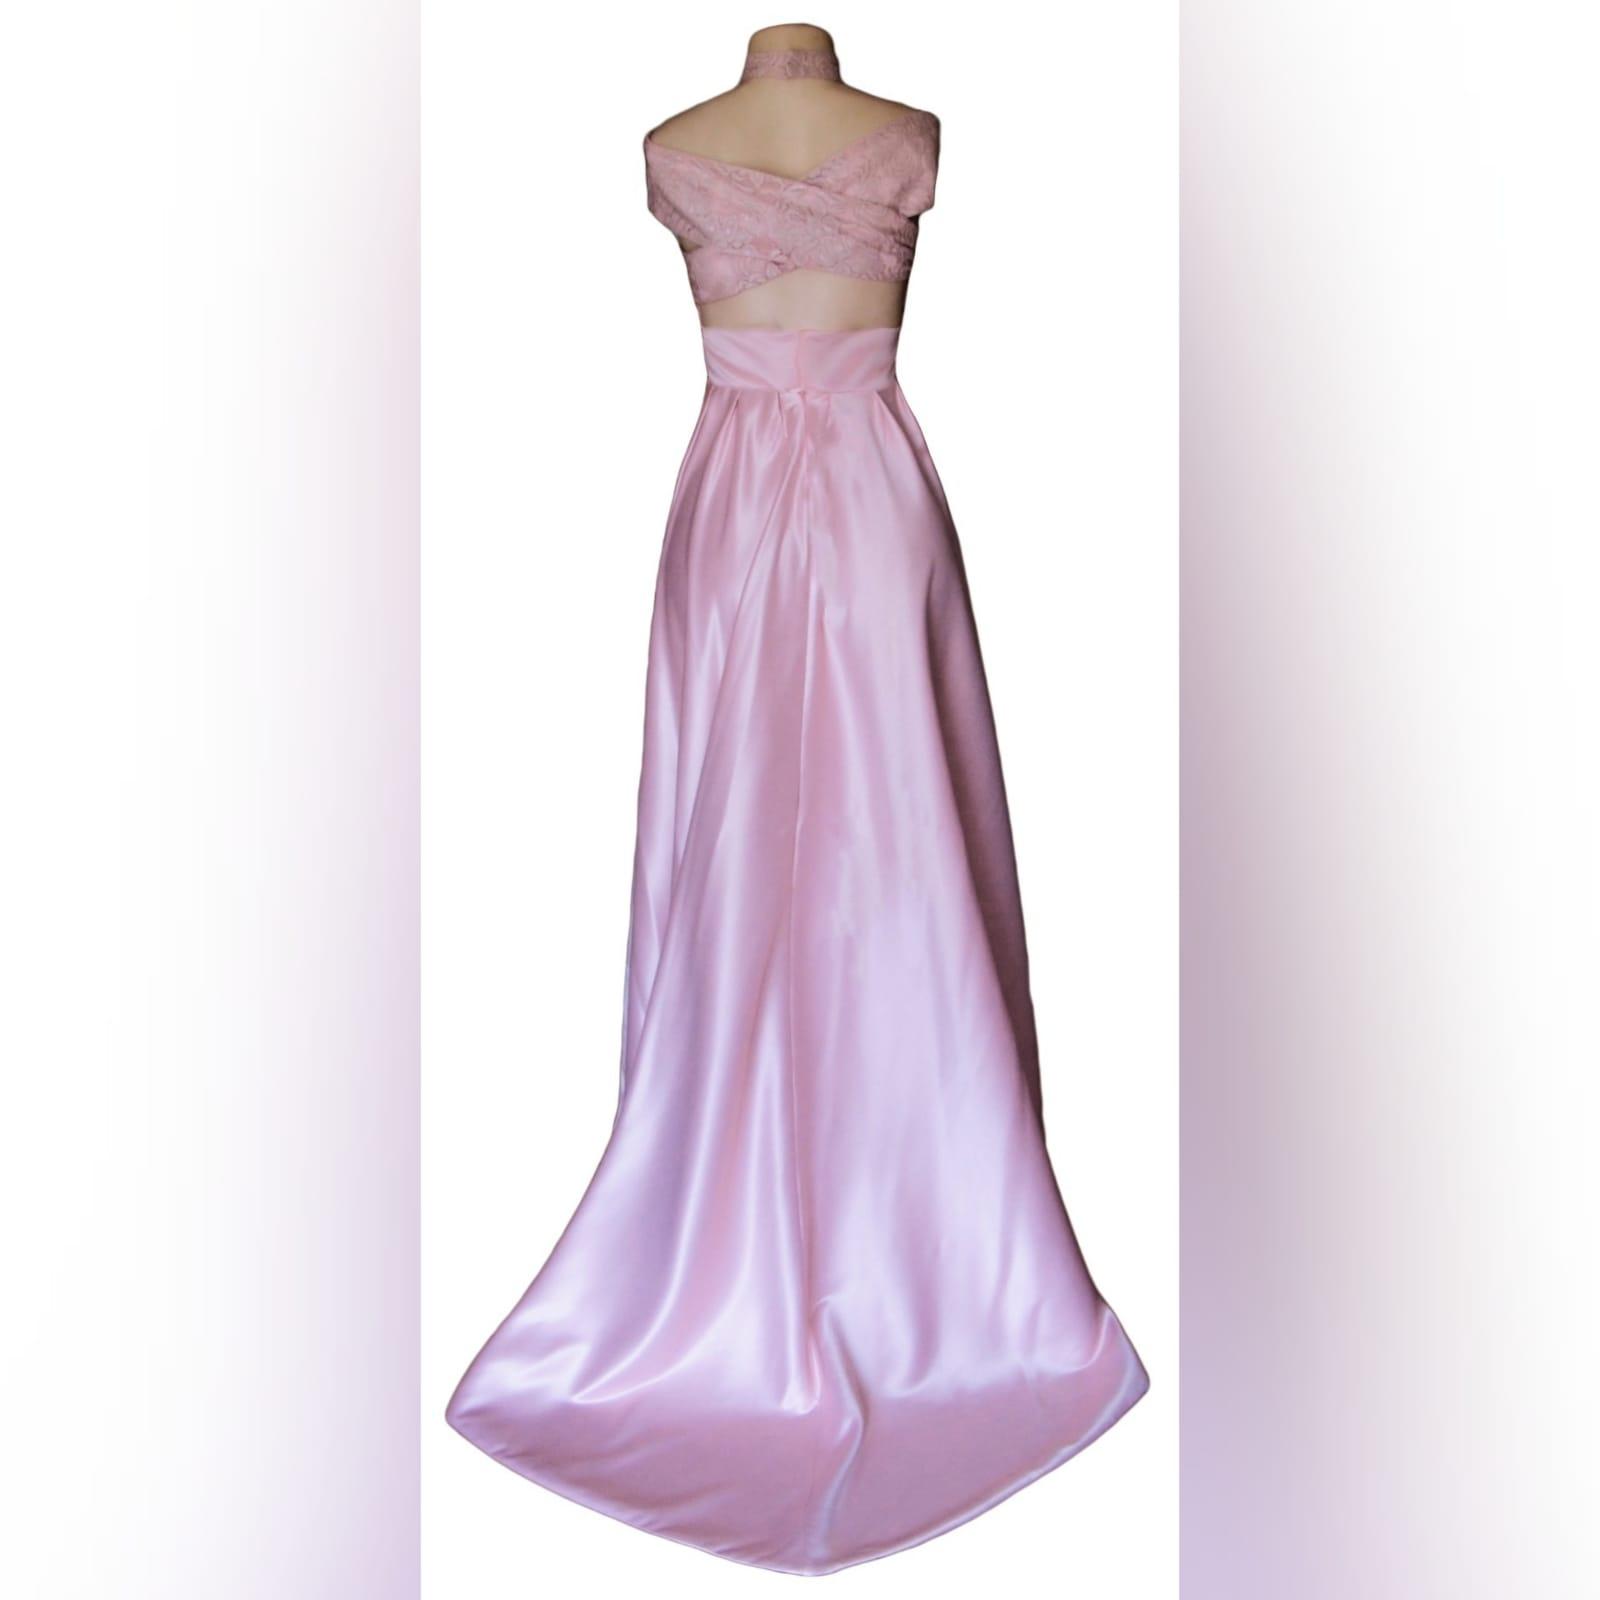 Rose pink plunging neckline off shoulder prom dress 3 rose pink plunging neckline off shoulder prom dress, flowy with a slit and a train. Crossed back design